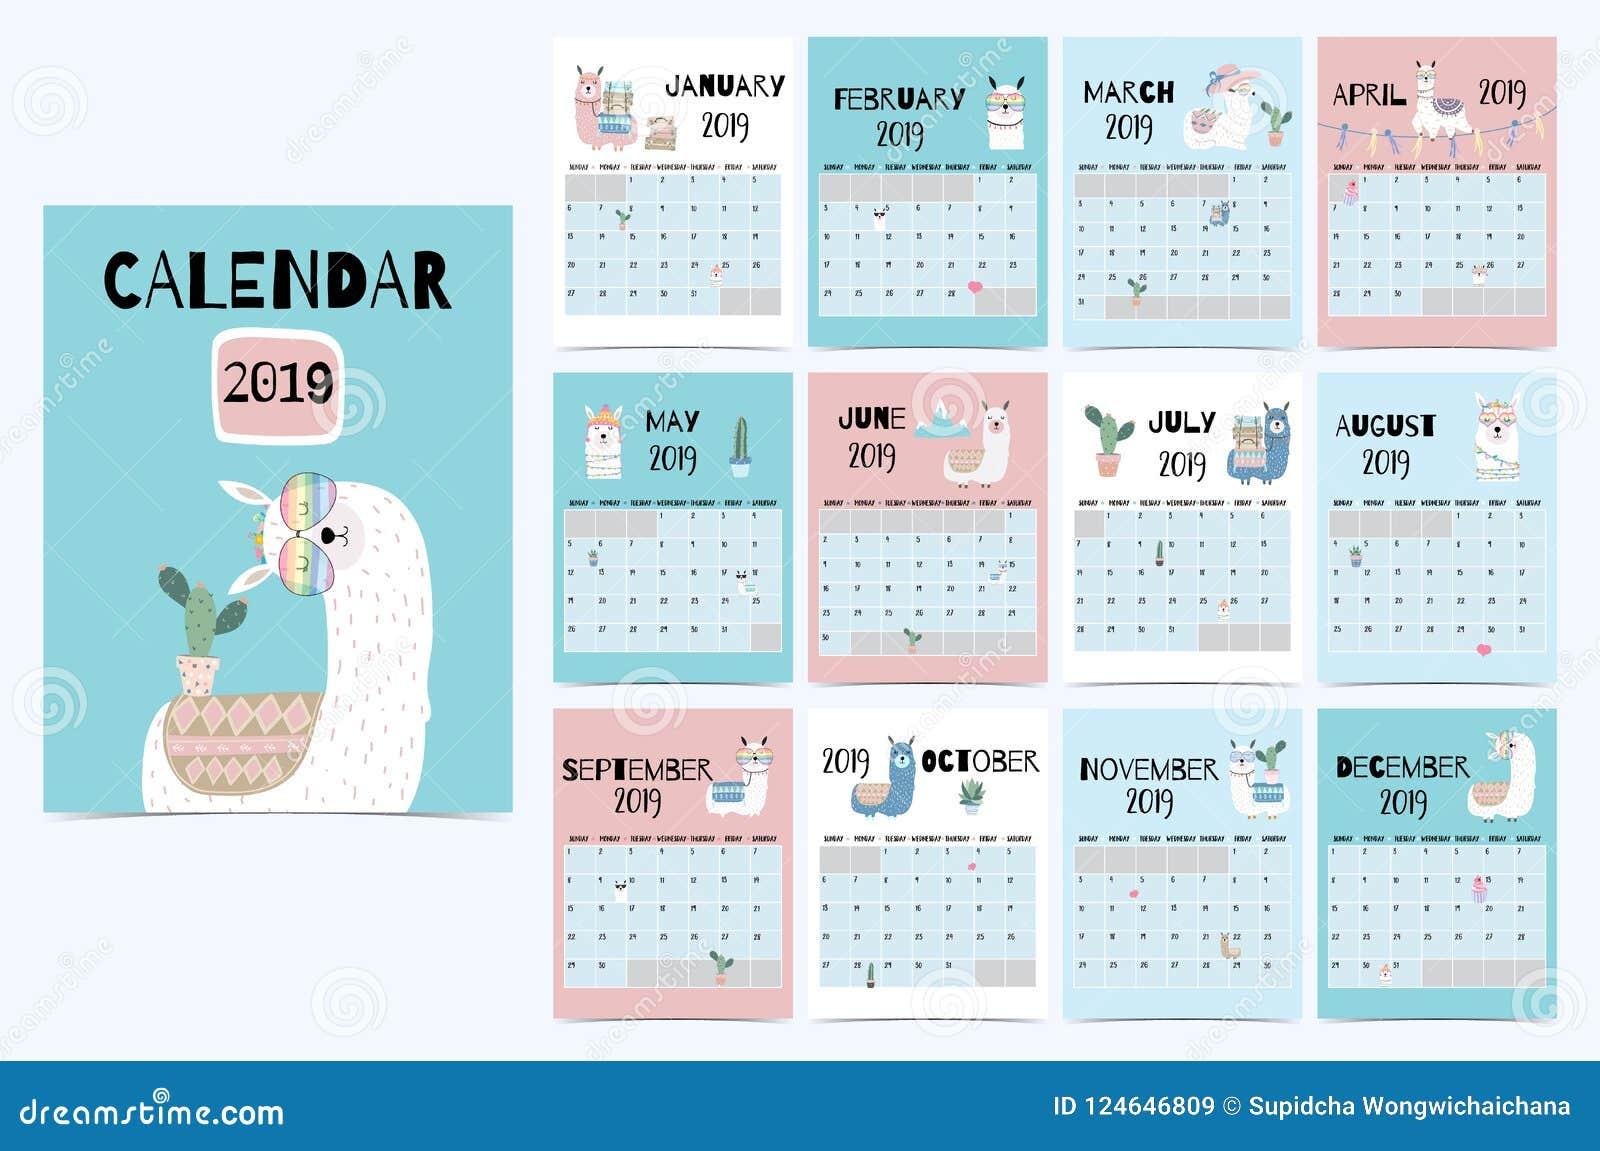 Gullig månatlig kalender 2019 med laman, bagage, kaktus som är geometrisk